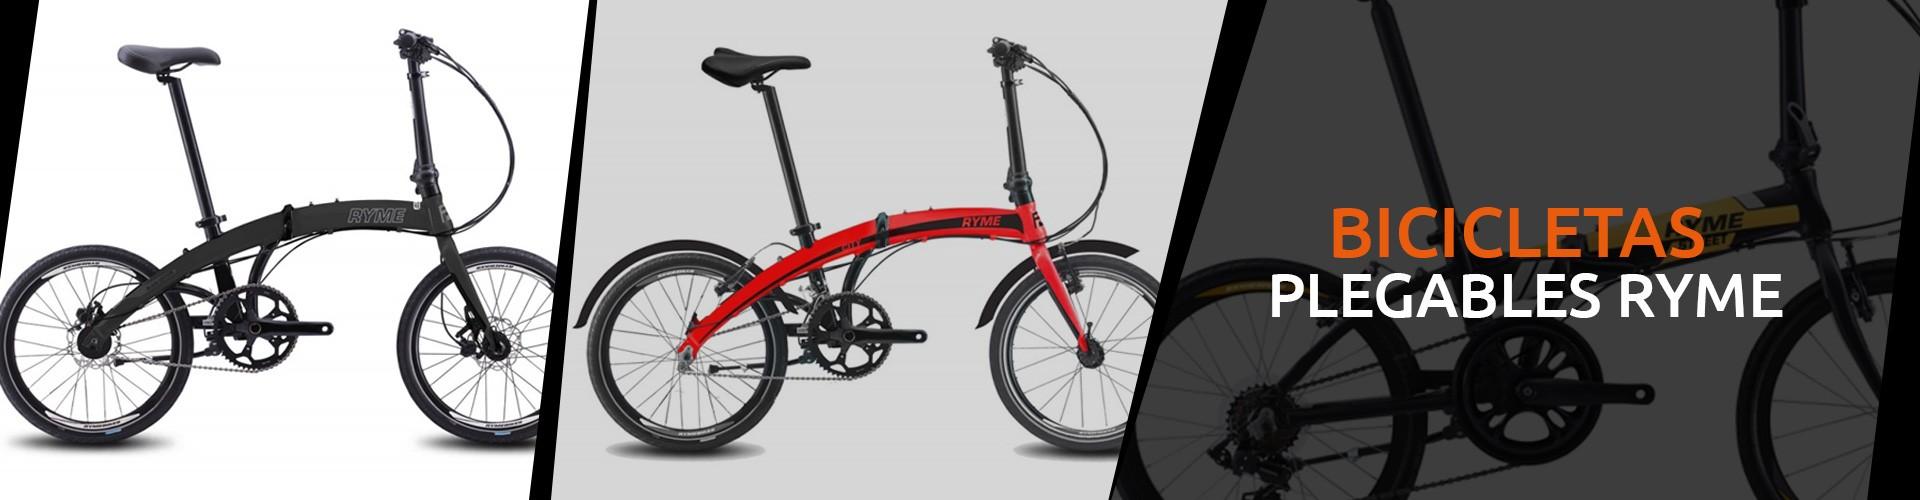 Bicicletas plegables Ryme